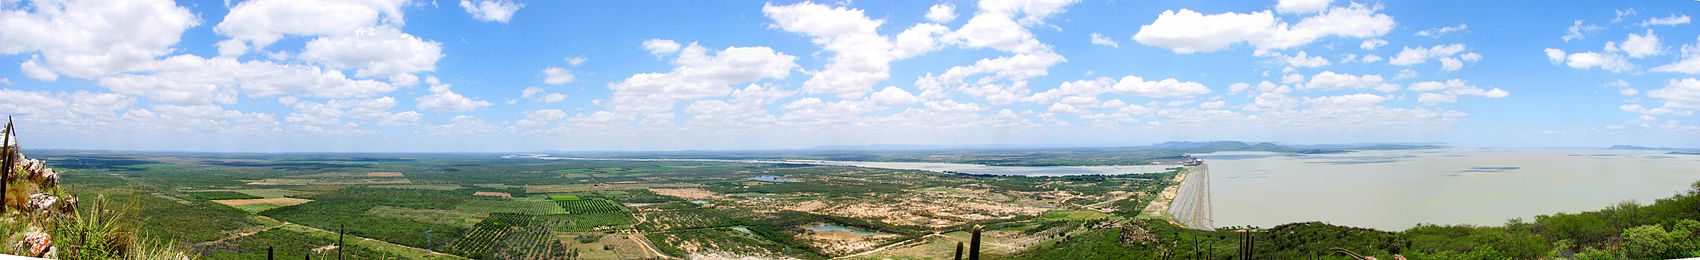 Panorama da Usina Hidrelétrica de Sobradinho.